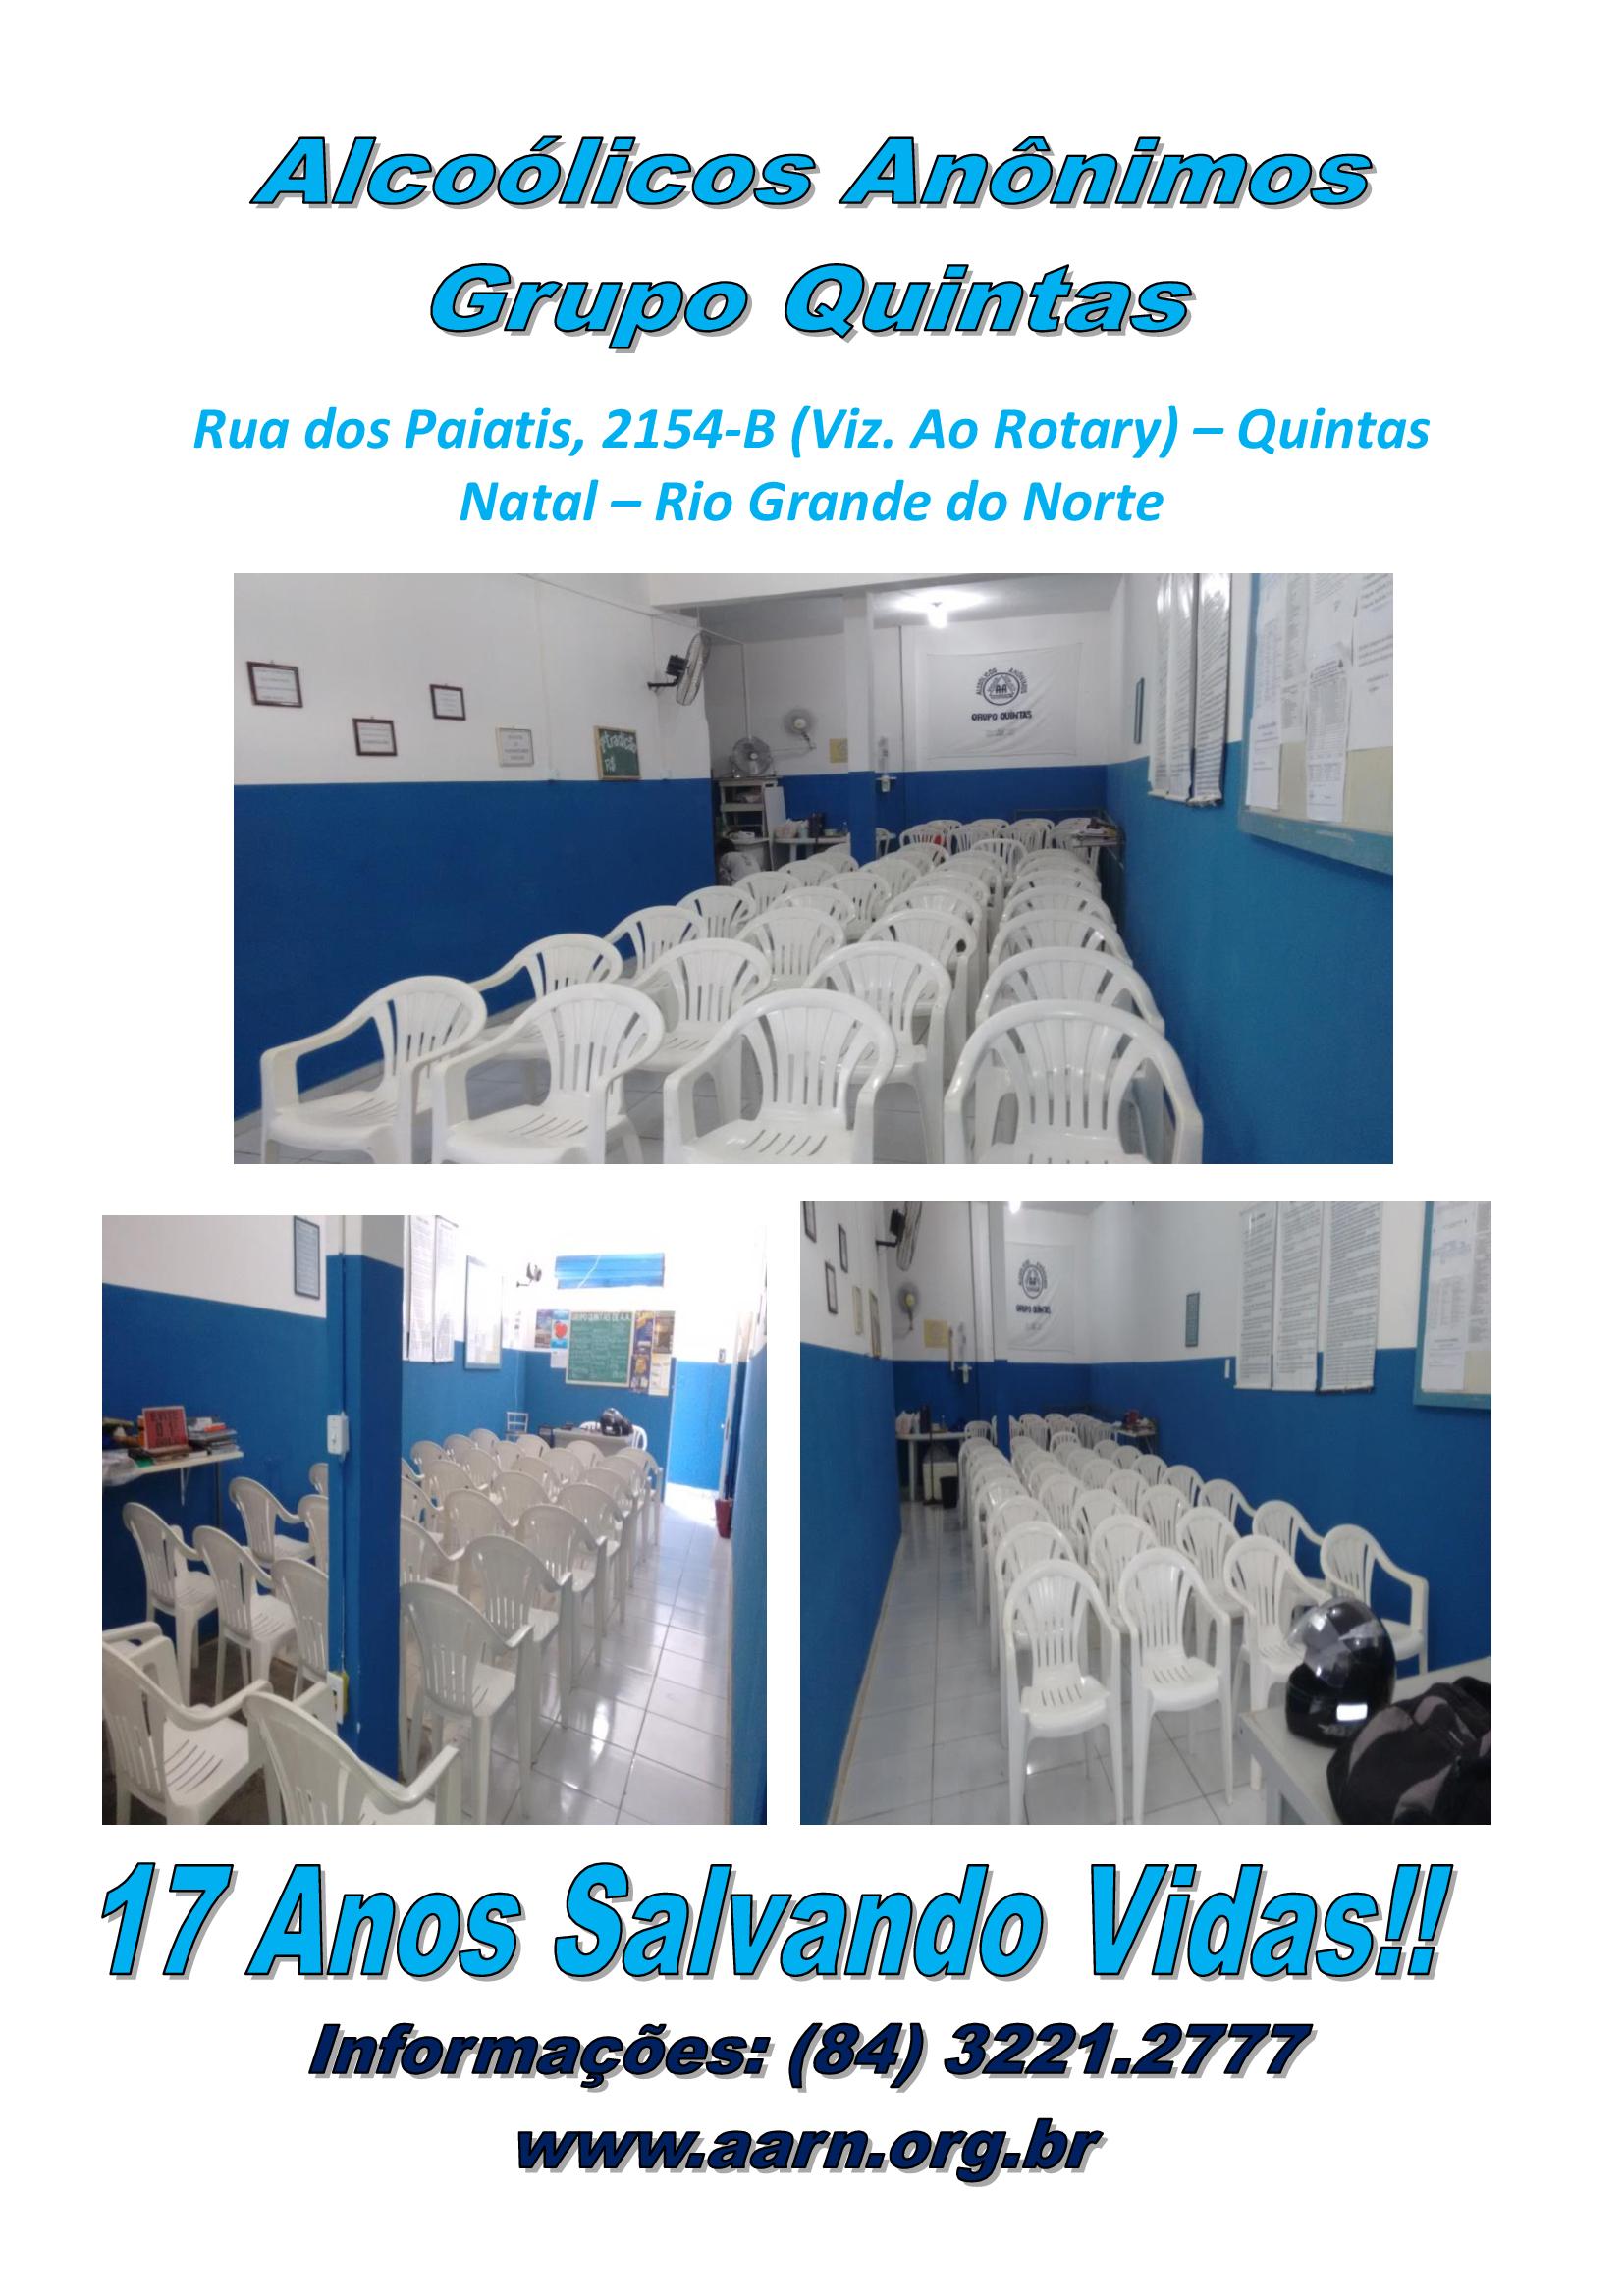 GRUPO-QUINTAS-17-ANOS